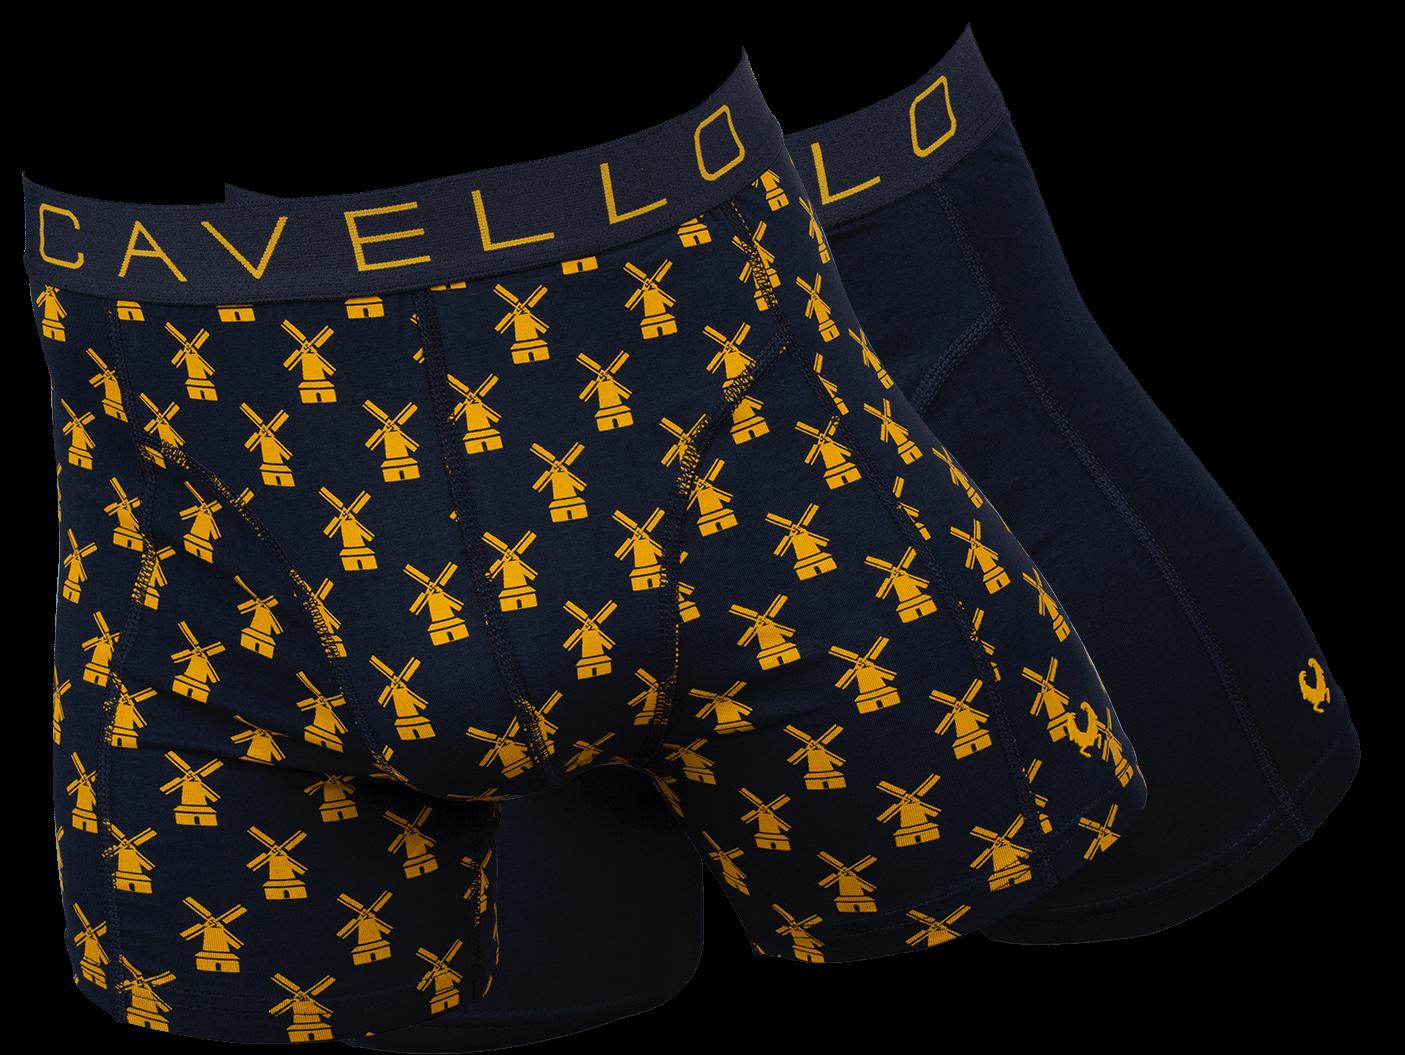 Cavello heren boxershort 2-pack 19009